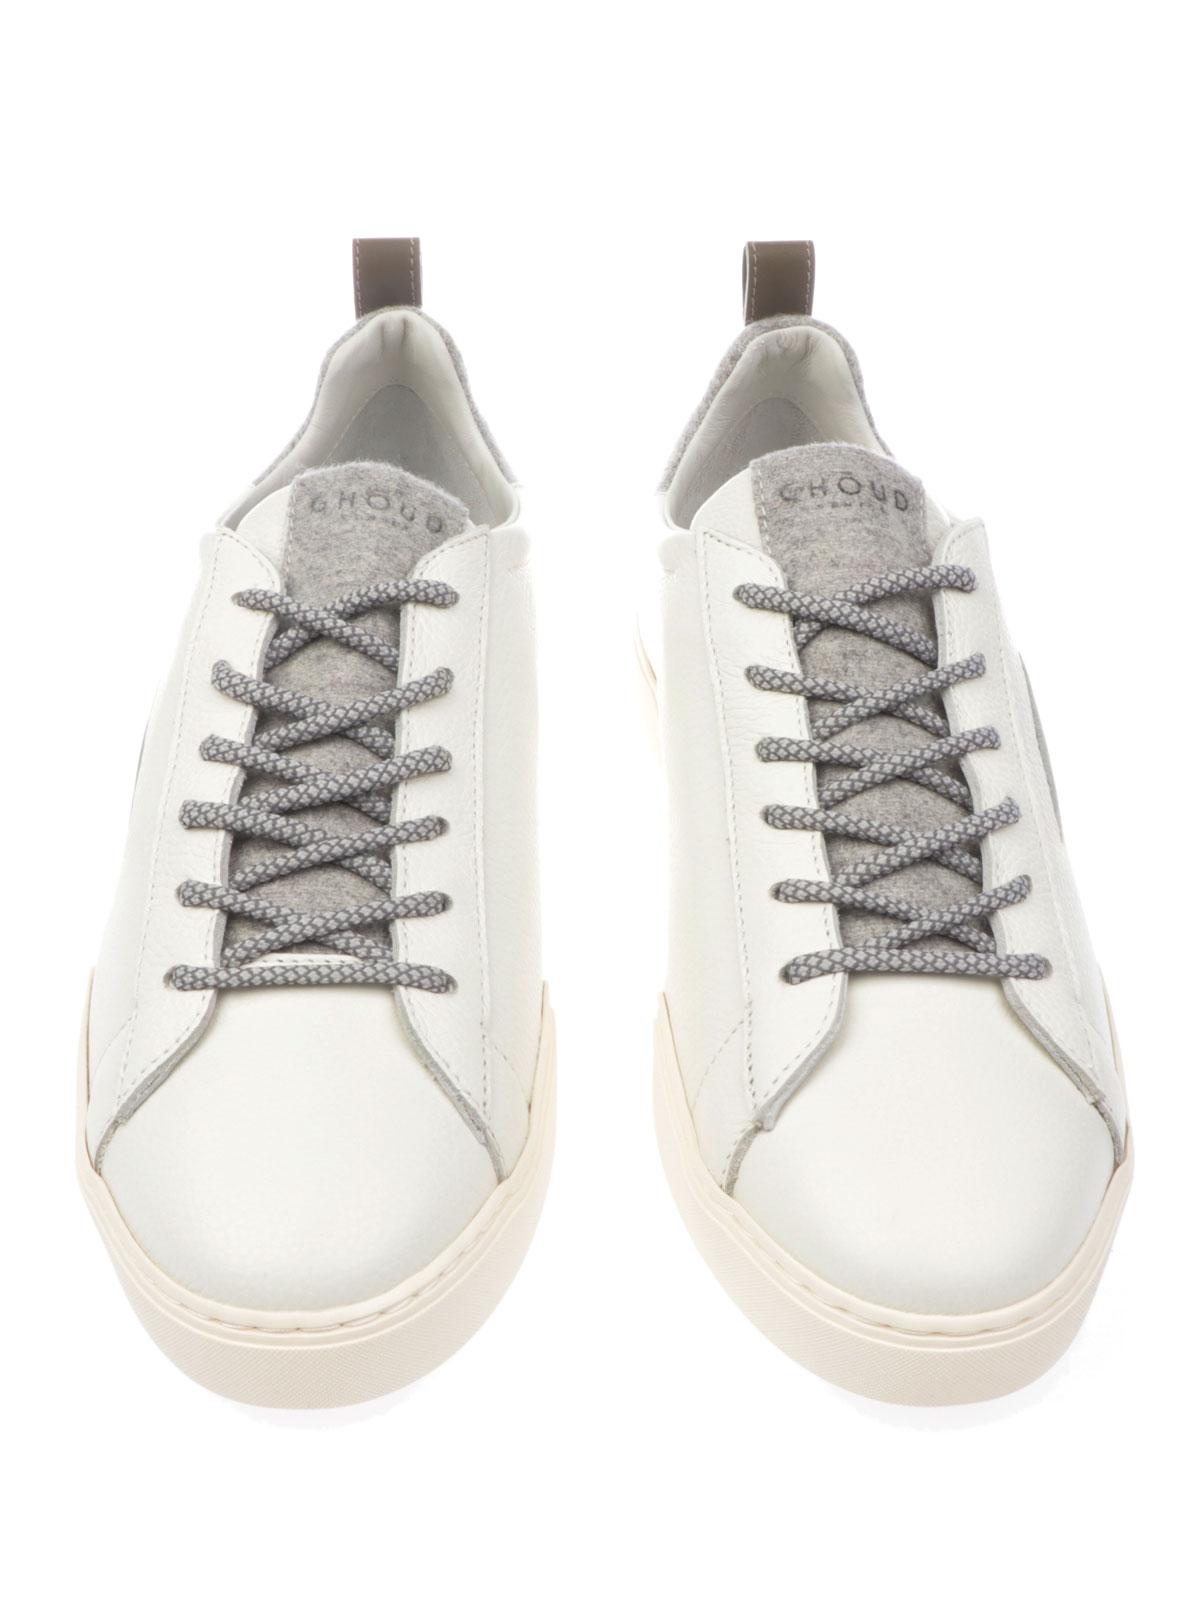 Picture of SEBAGO   Men's Adult Shoes Sneakers